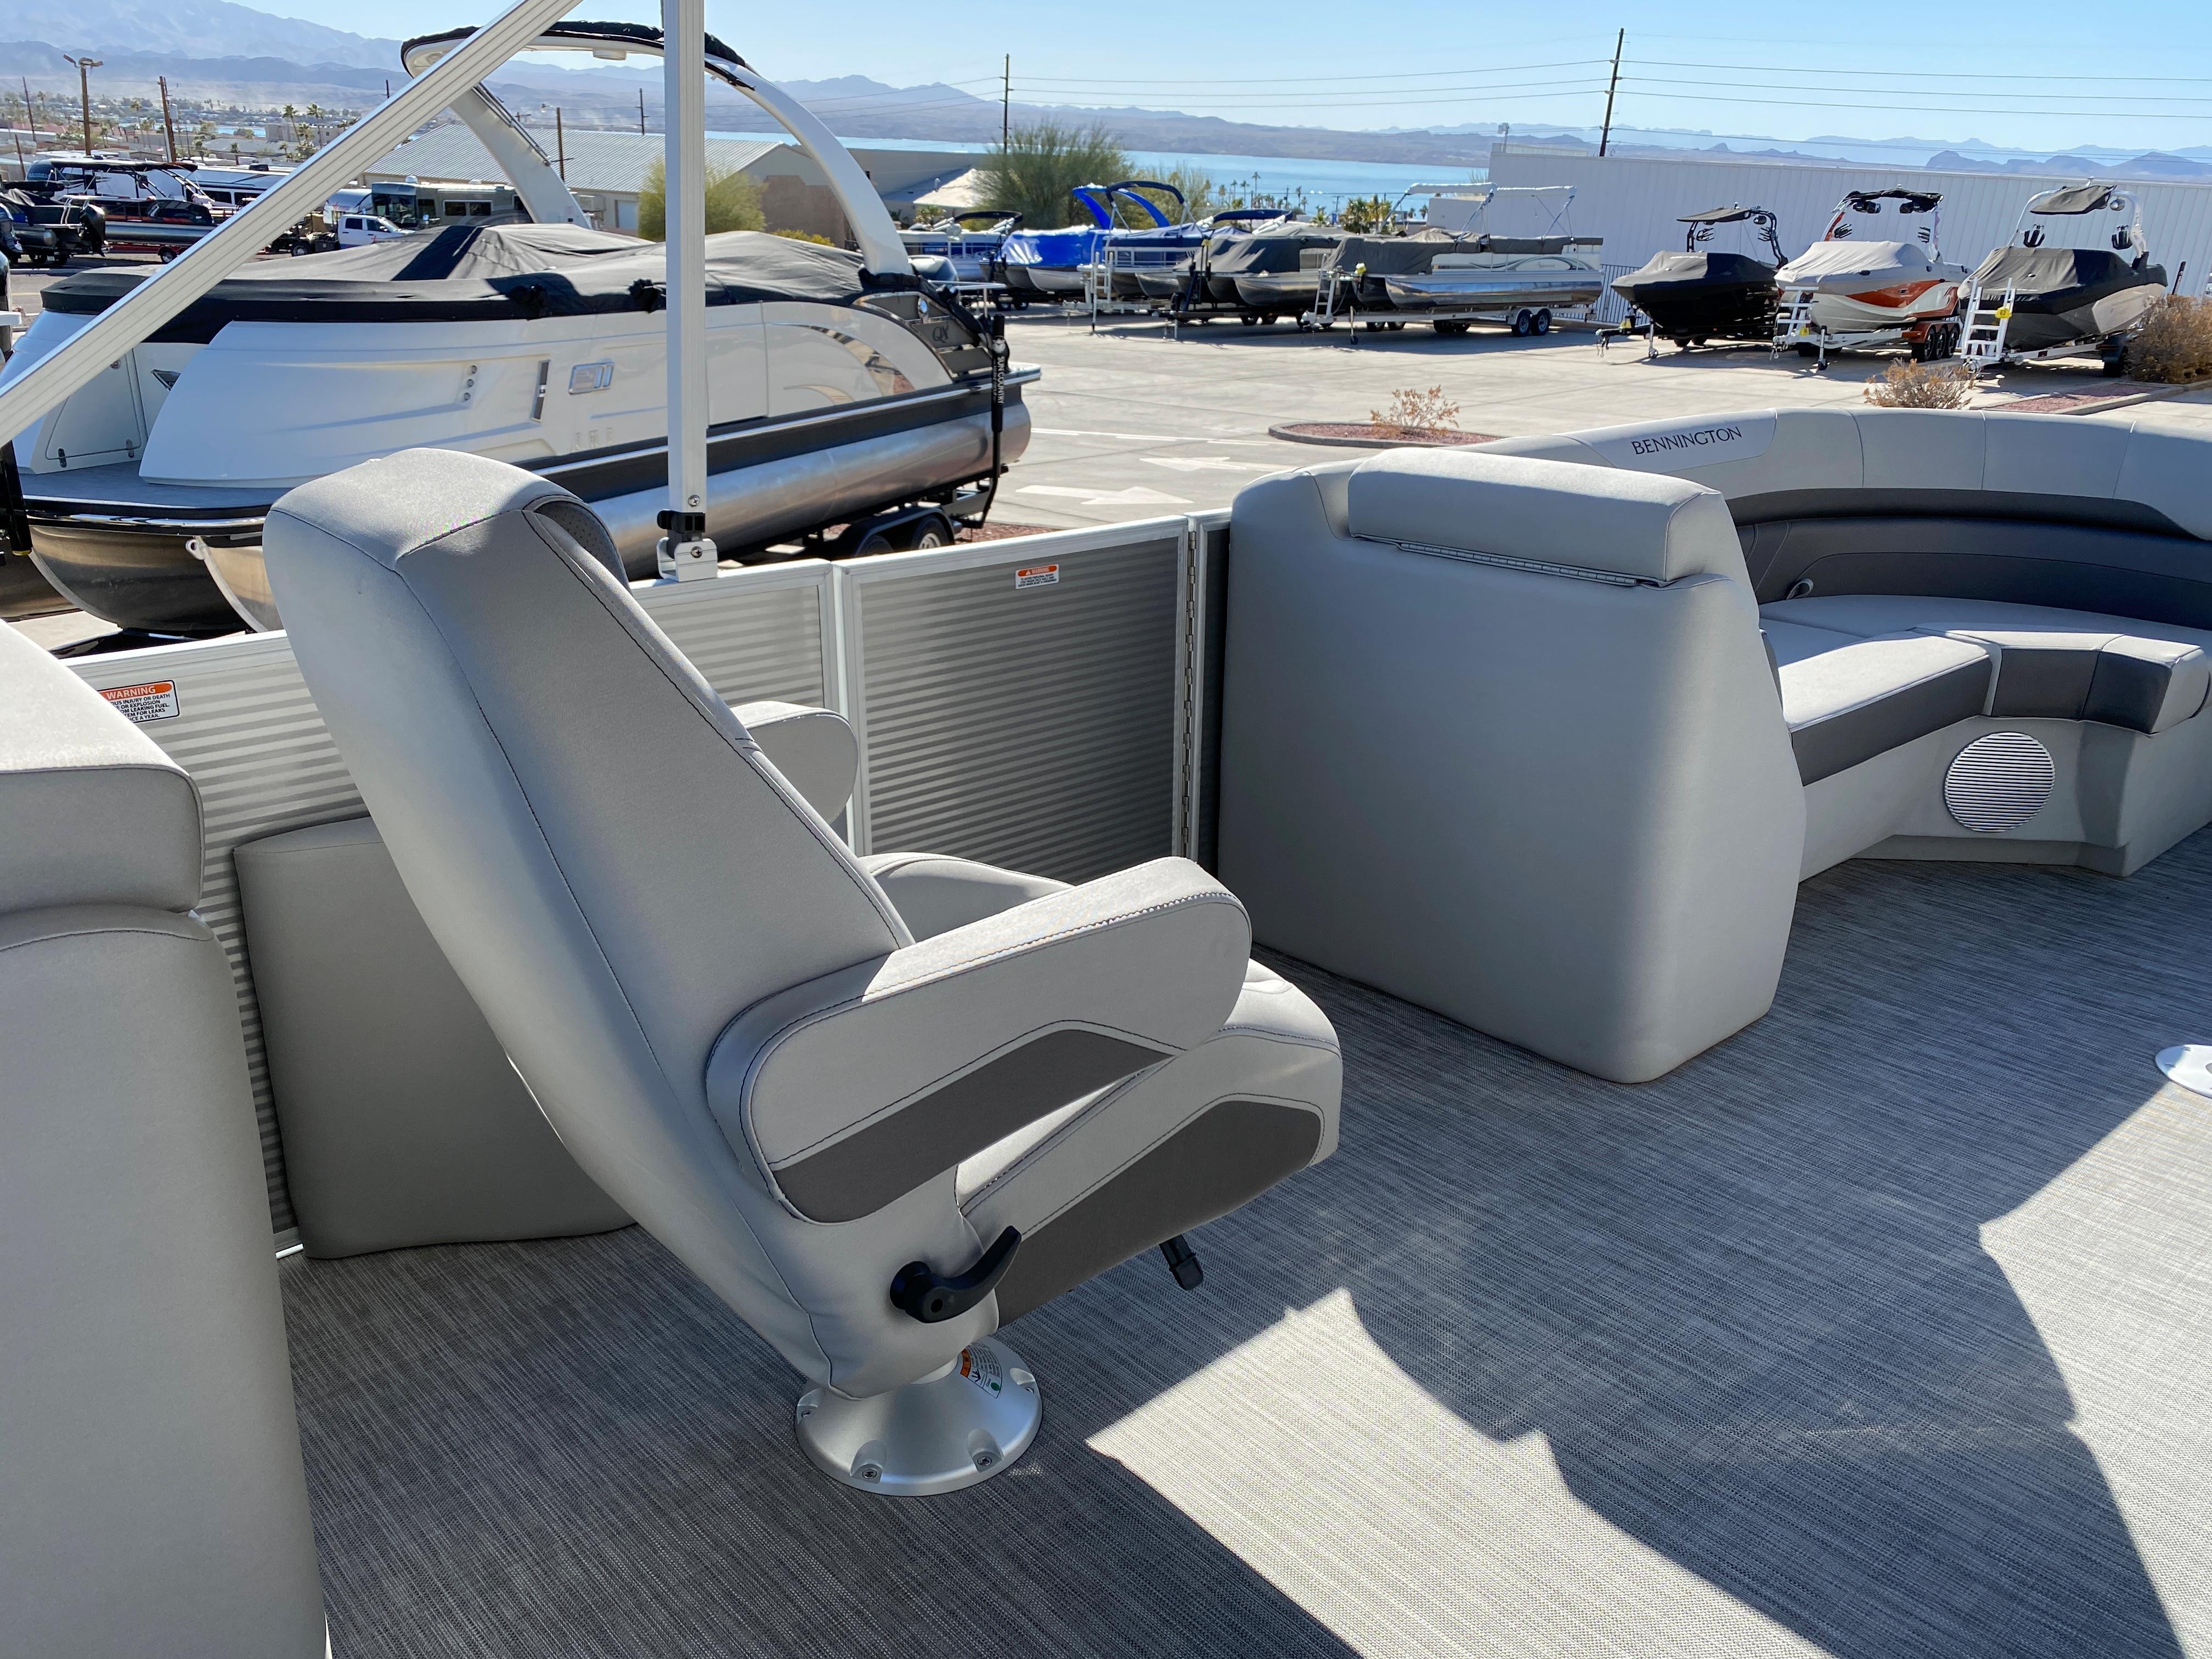 2021 Bennington 22 SSRX SPS #B2558K inventory image at Sun Country Inland in Lake Havasu City